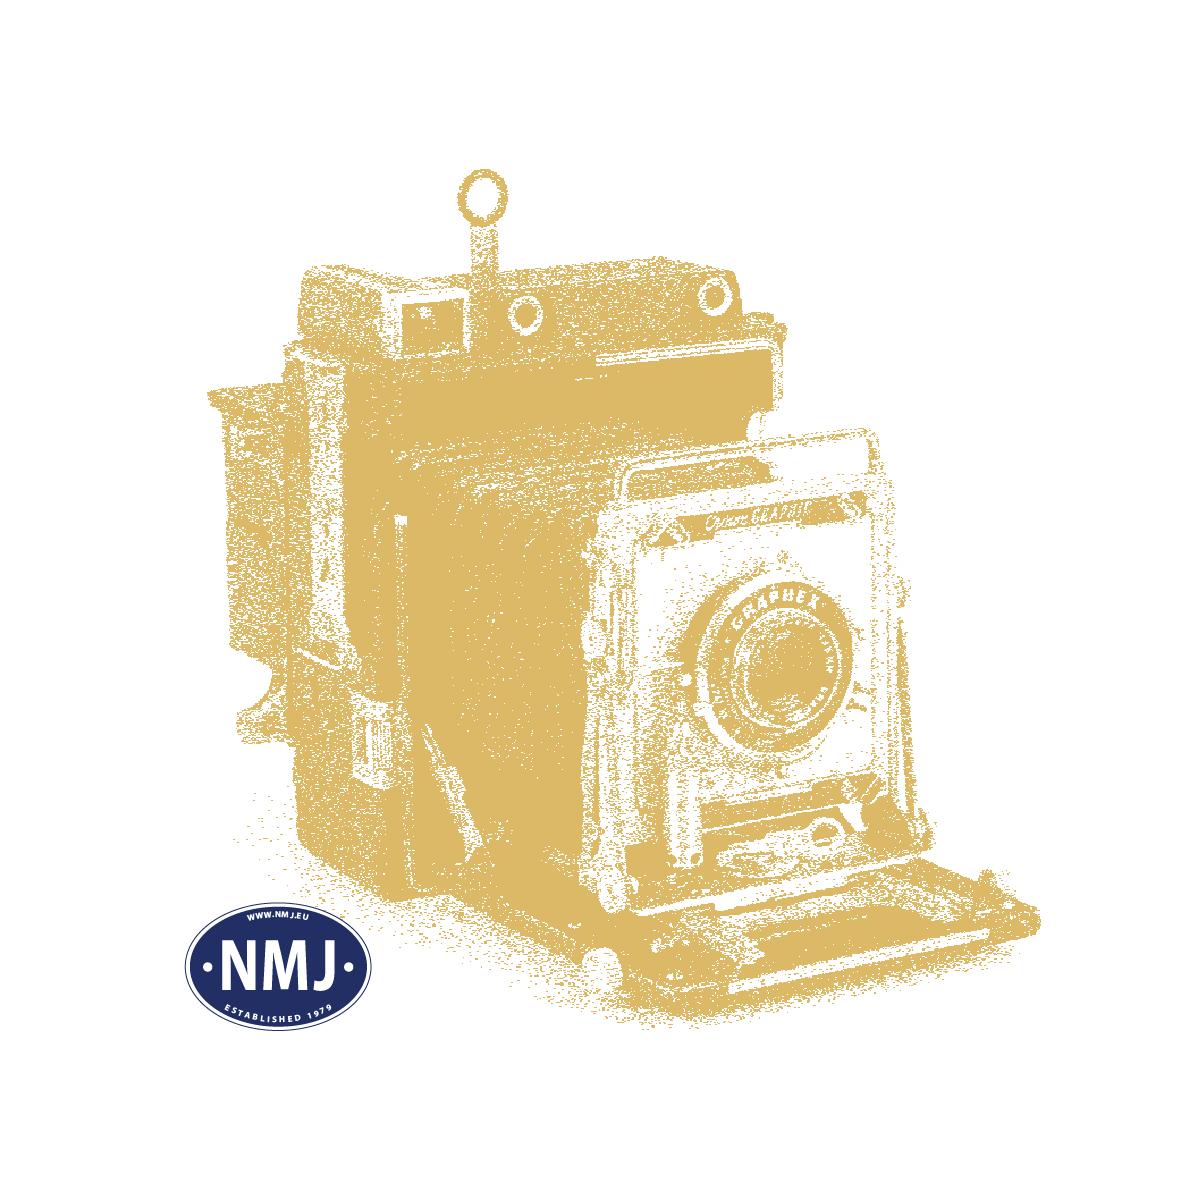 NOC15242 - Reisende